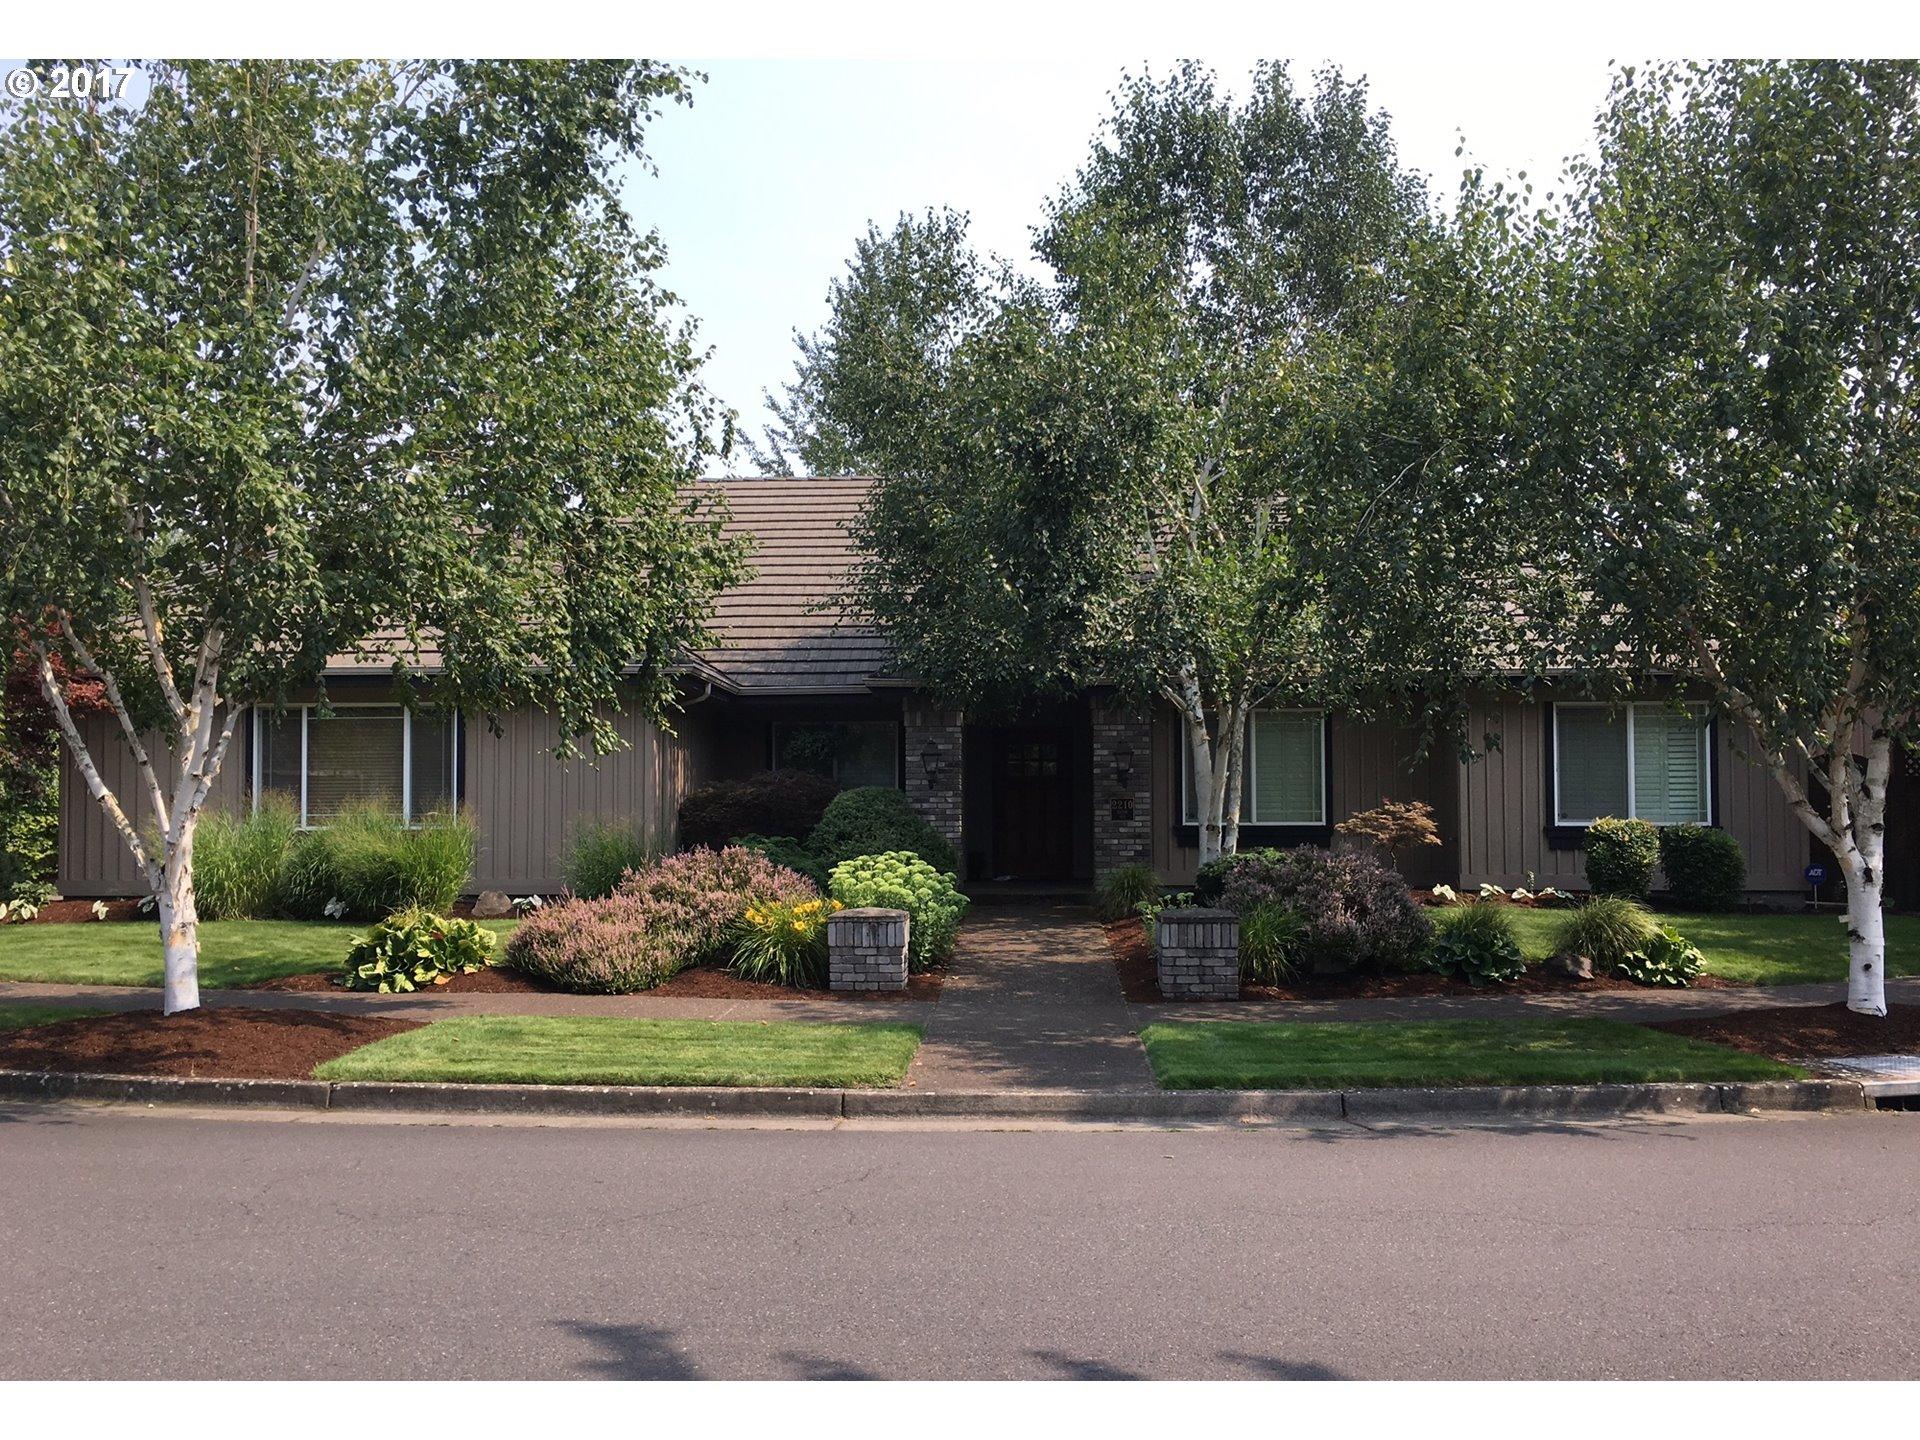 2210 DEVON AVE, Eugene, OR 97408